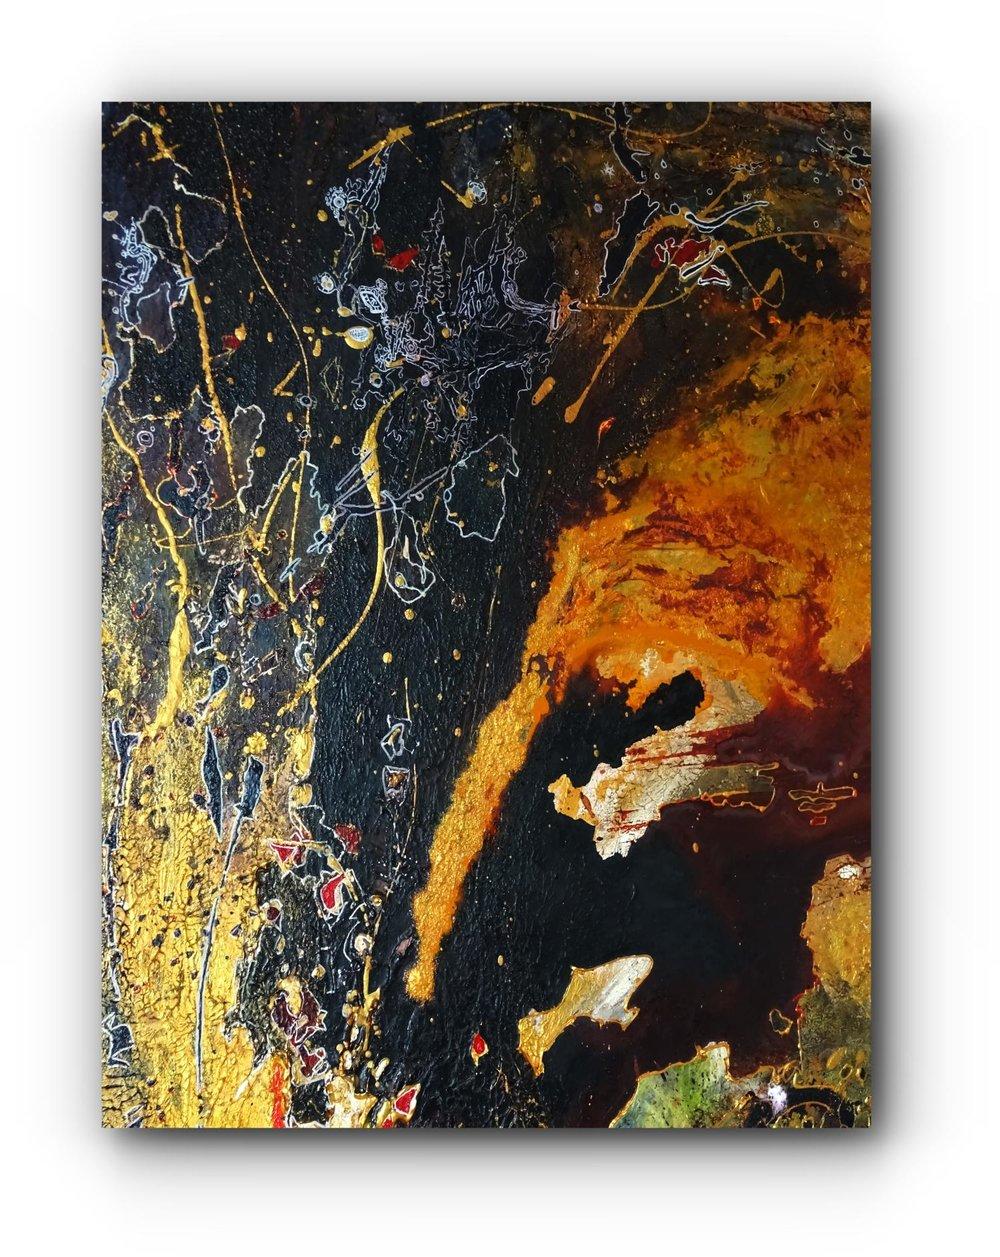 painting-detail-6-golden-sanctuary-artists-ingress-vortices.jpg